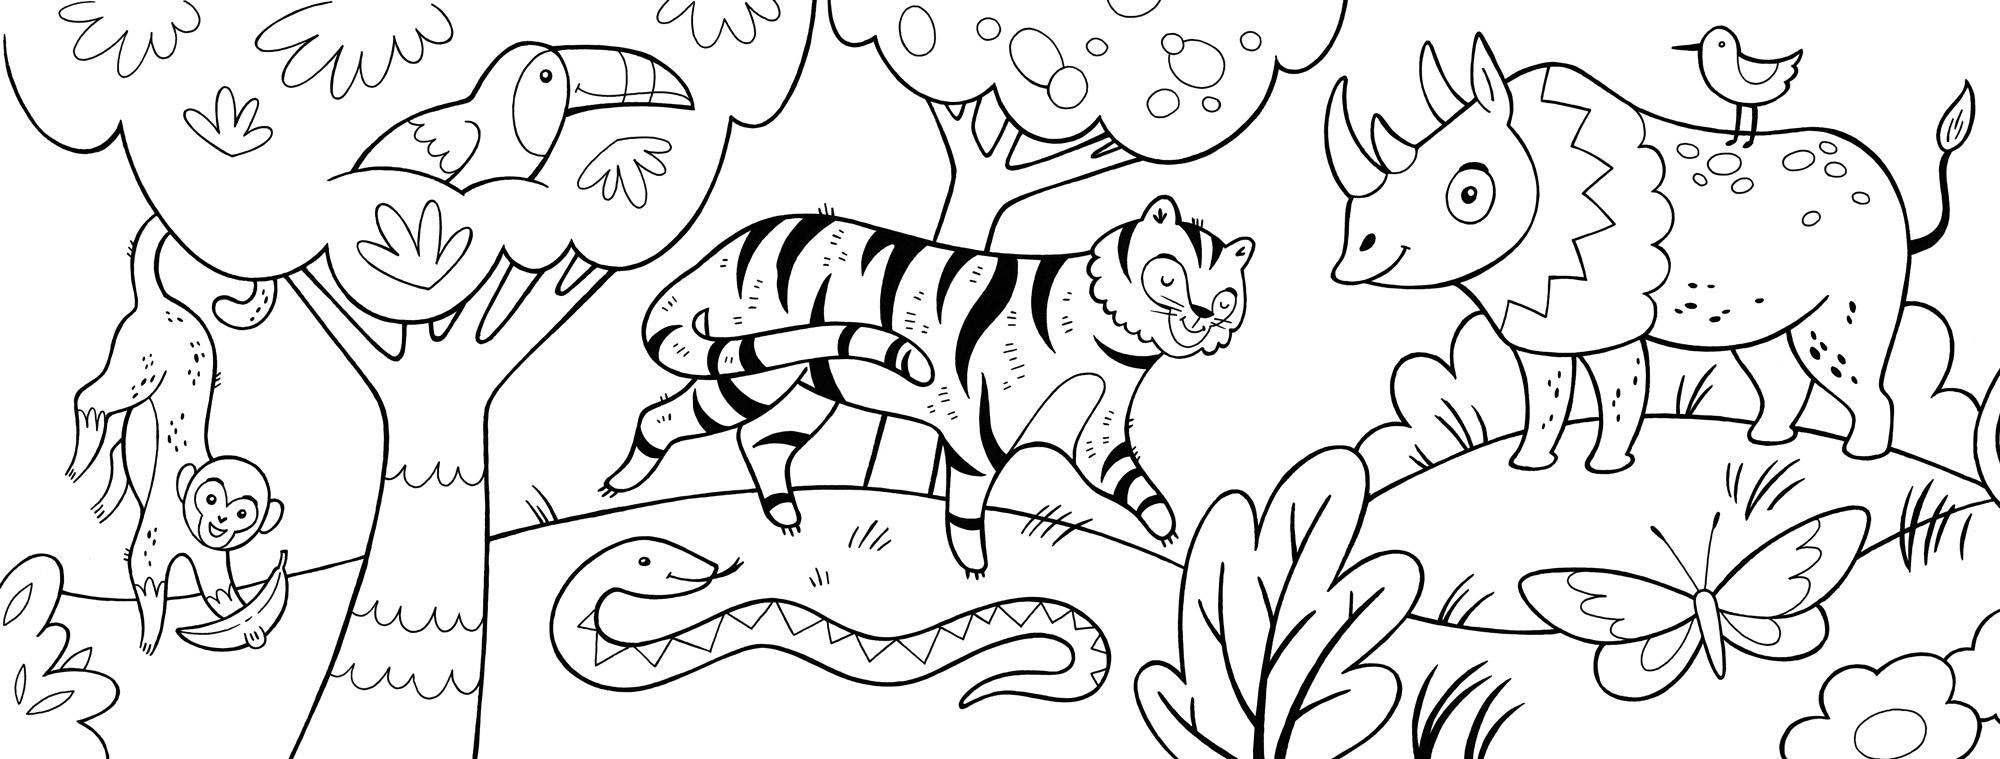 brand new coloring rolls for mudpuppy u2013 anni betts illustration